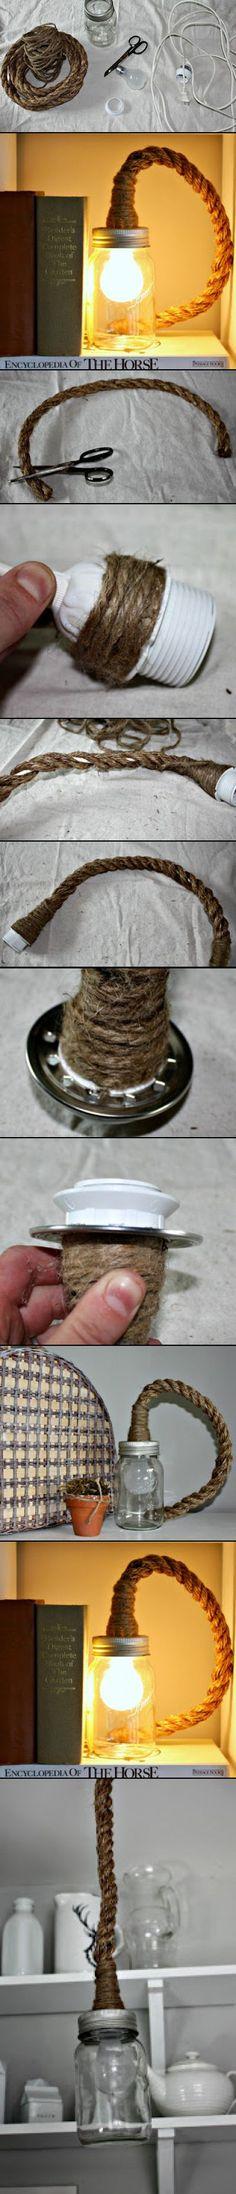 DIY Mason Jar Rope Light | #DIY #HOME #Decor | DIY & Crafts